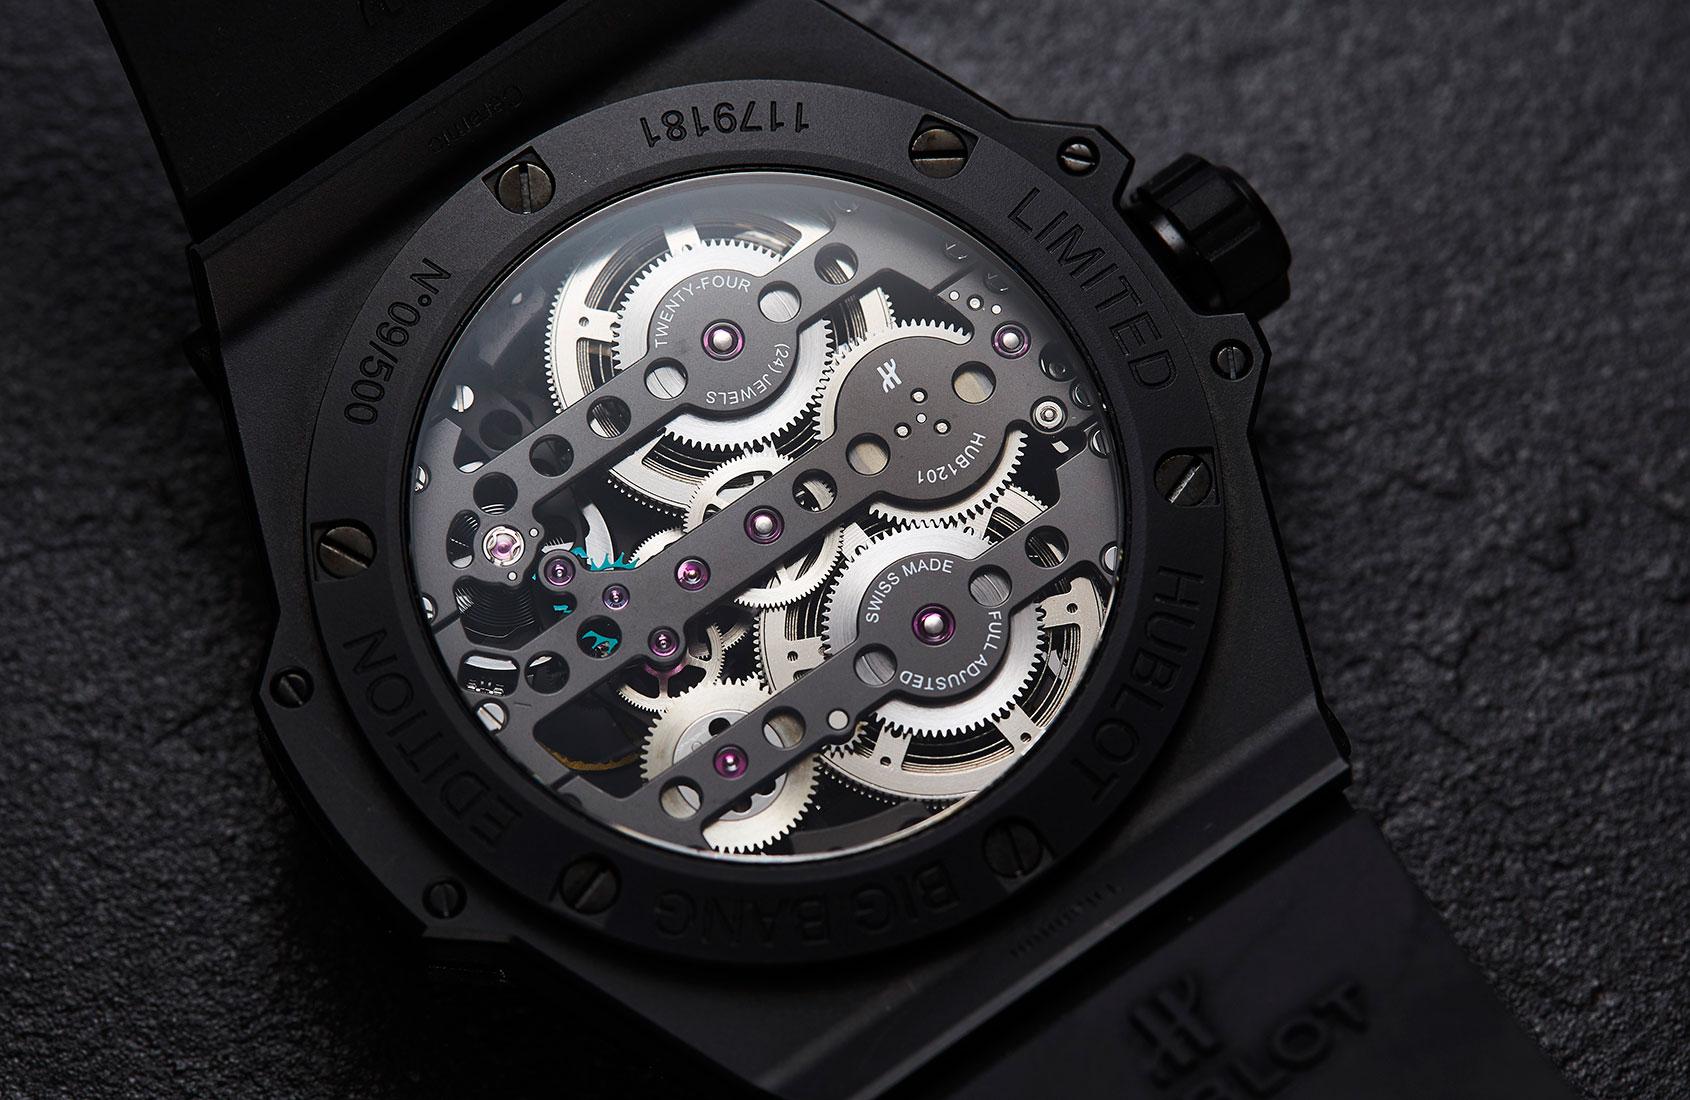 hublot-big-bang-meca-10-review-2